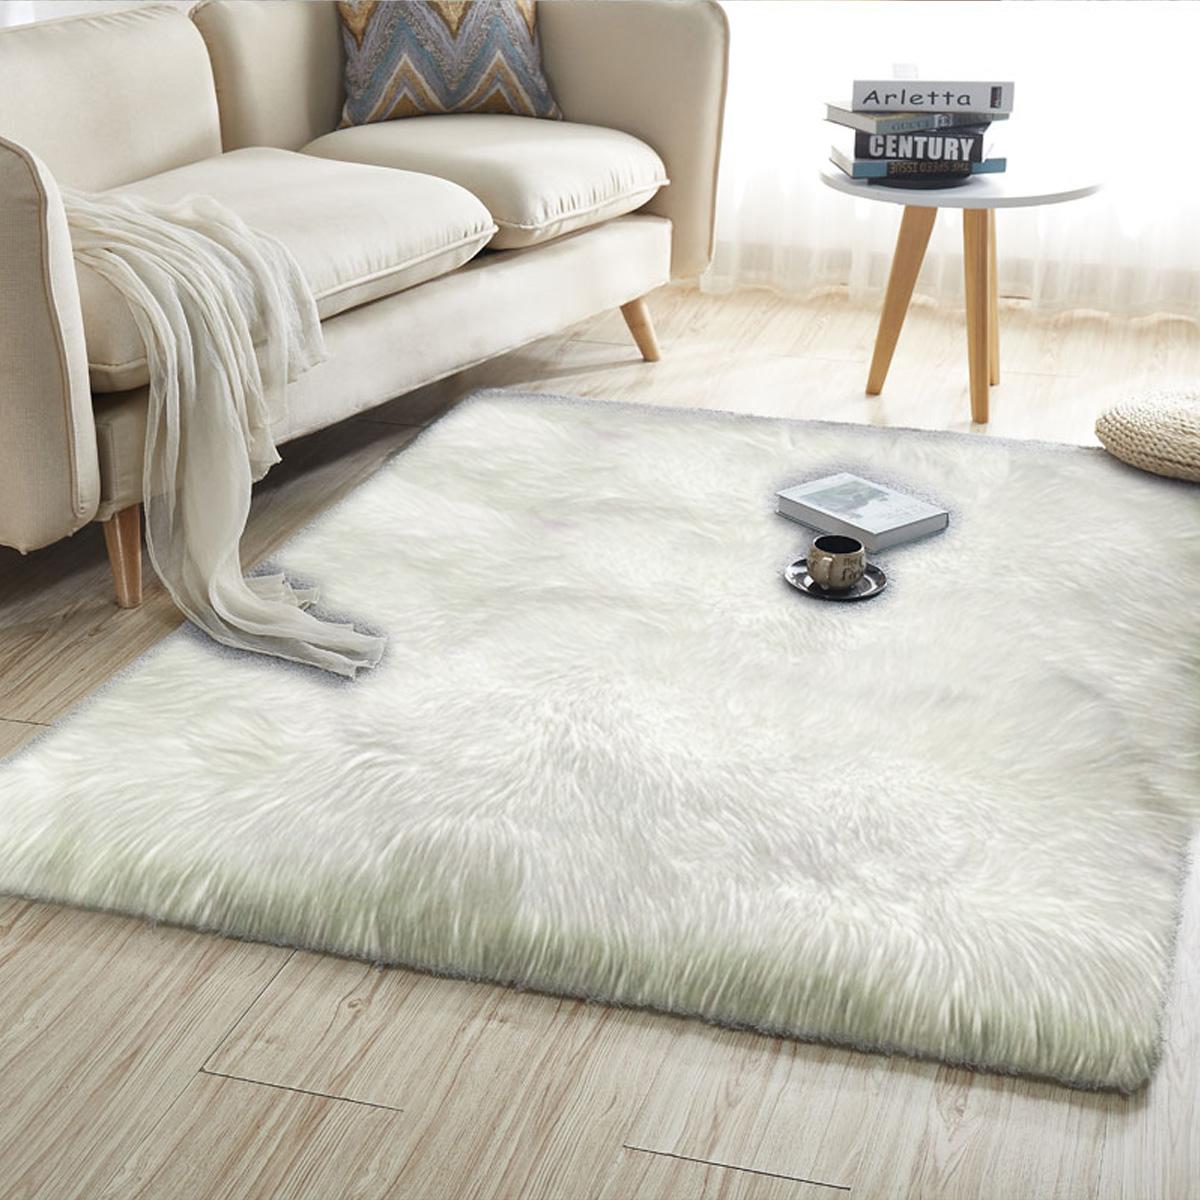 ko faux lammfell schaffell teppich sofa matte fell naturfell viele modelle tp v ebay. Black Bedroom Furniture Sets. Home Design Ideas